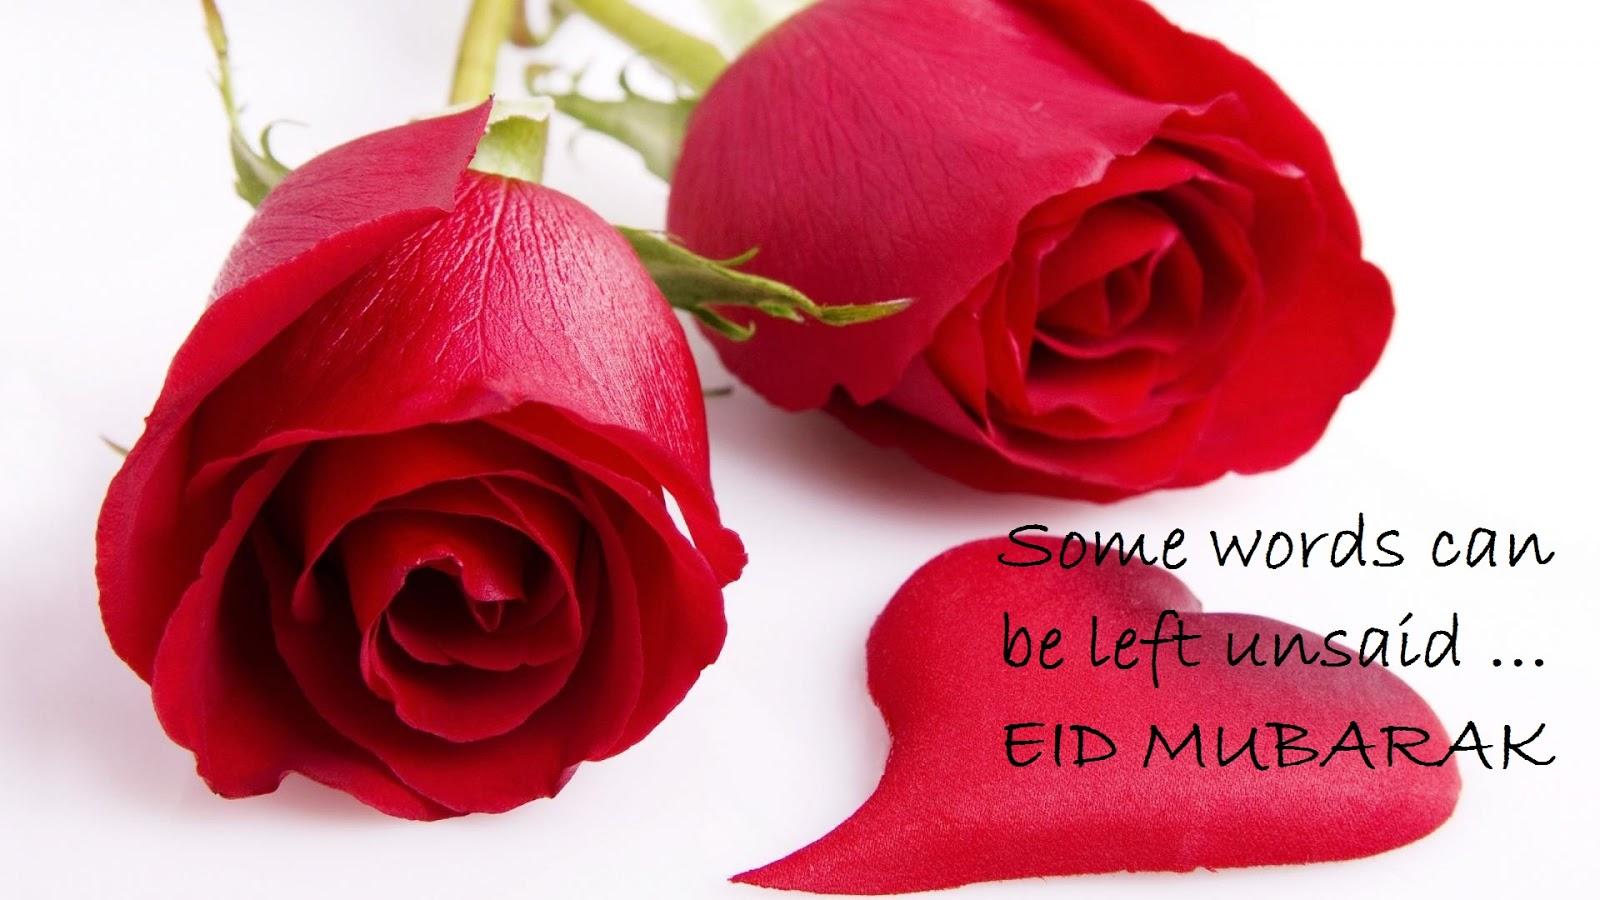 Great Wallpaper Love Eid Mubarak - eid+wish+for+your+love+one  Pic_419950.jpg